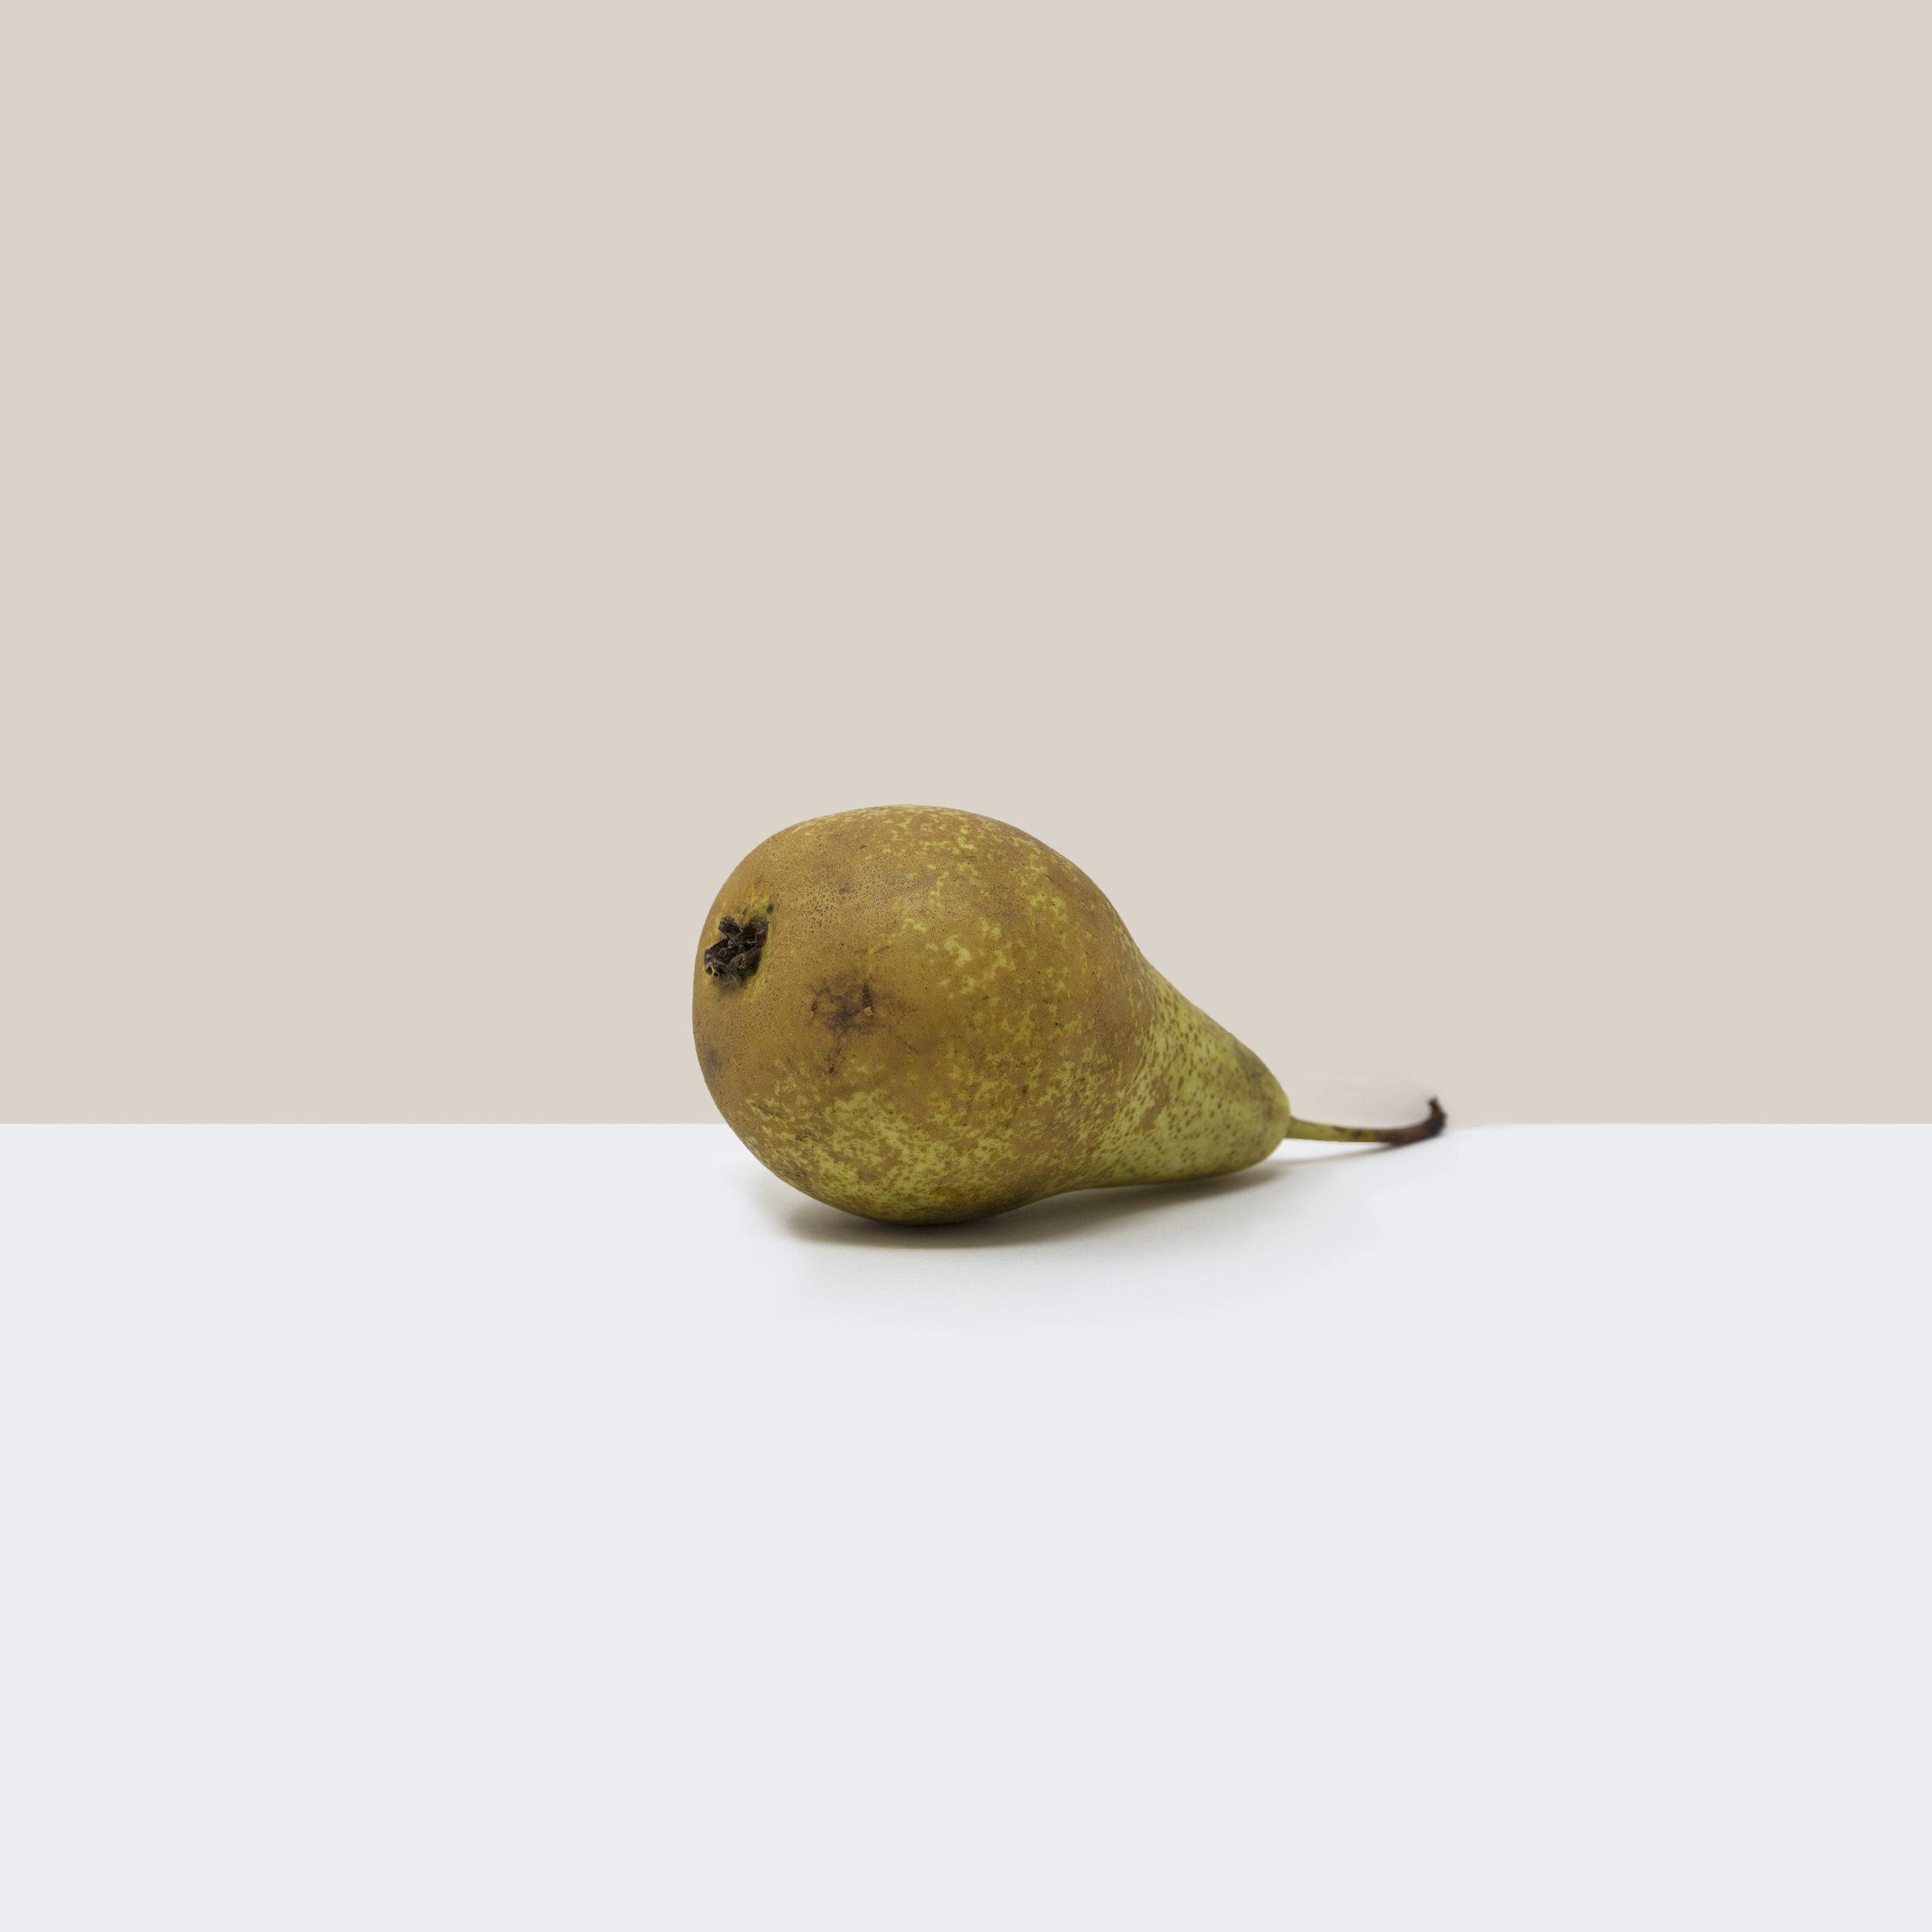 A simple, minimalist, contemporary, fine art photograph of a pear